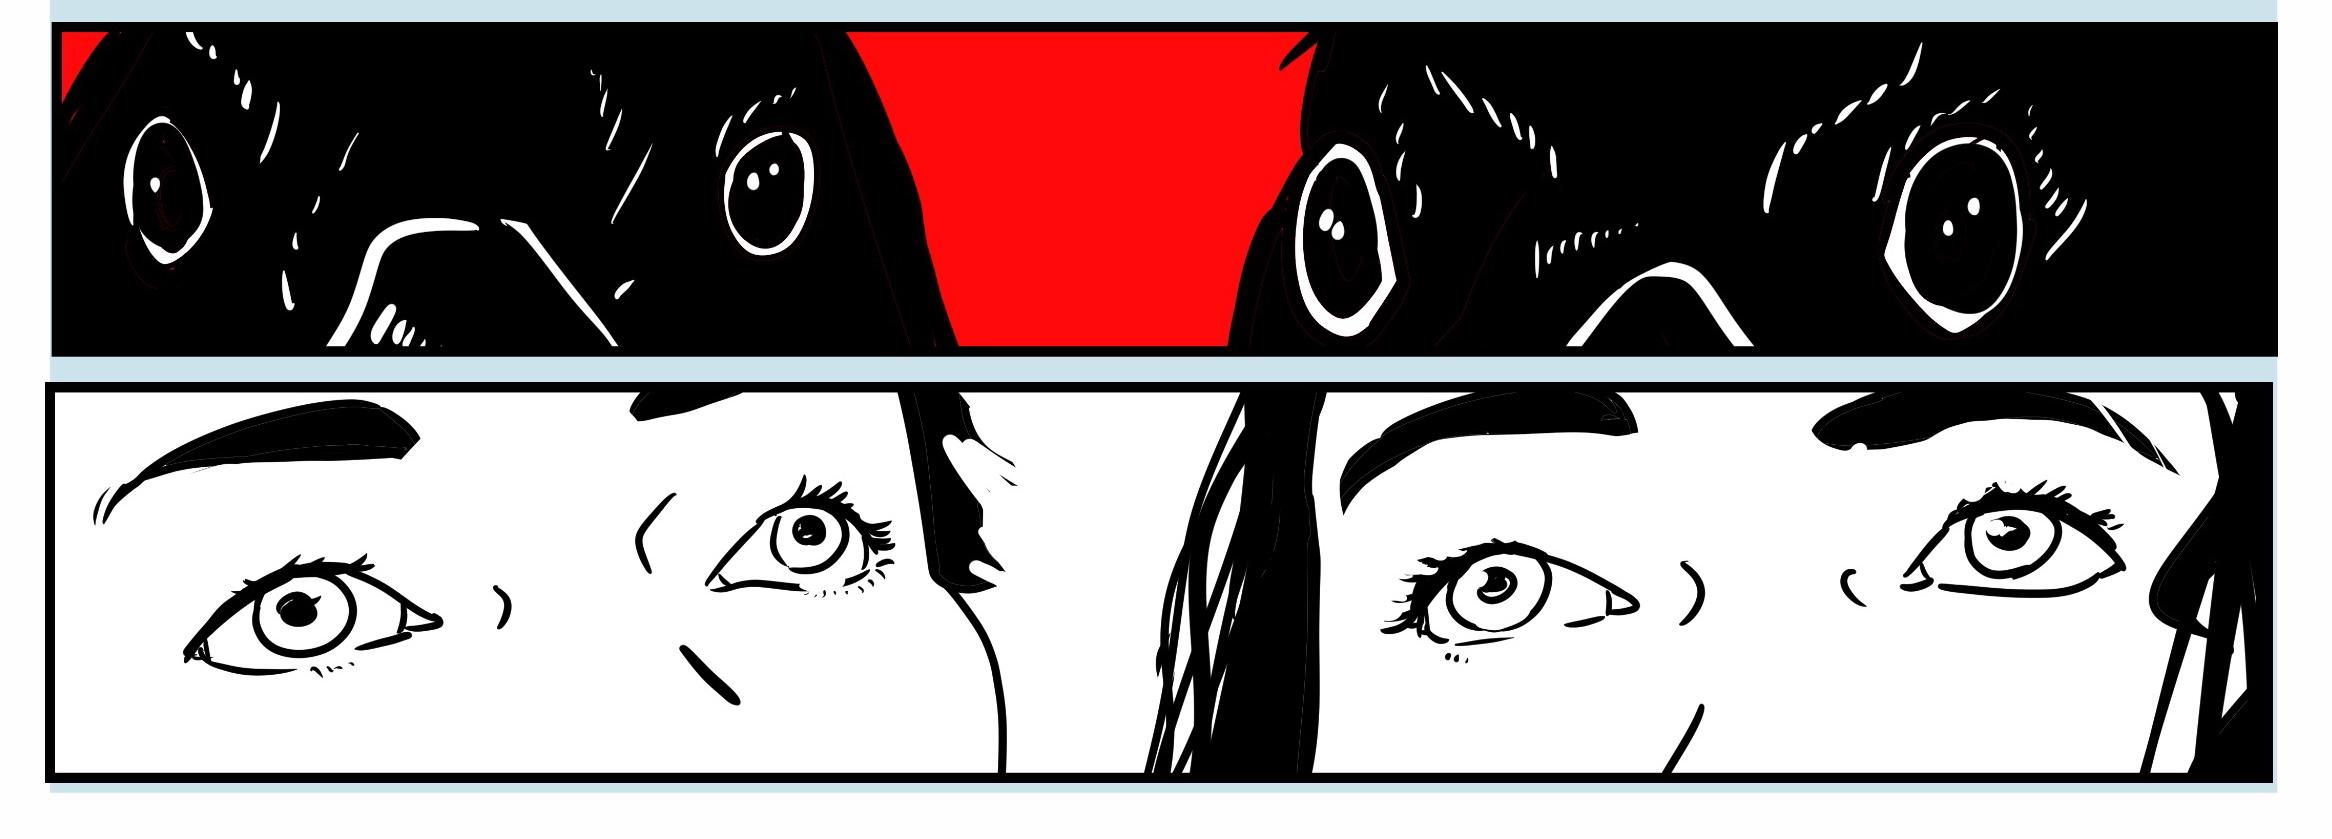 crow magnum comics becky jewell.jpg